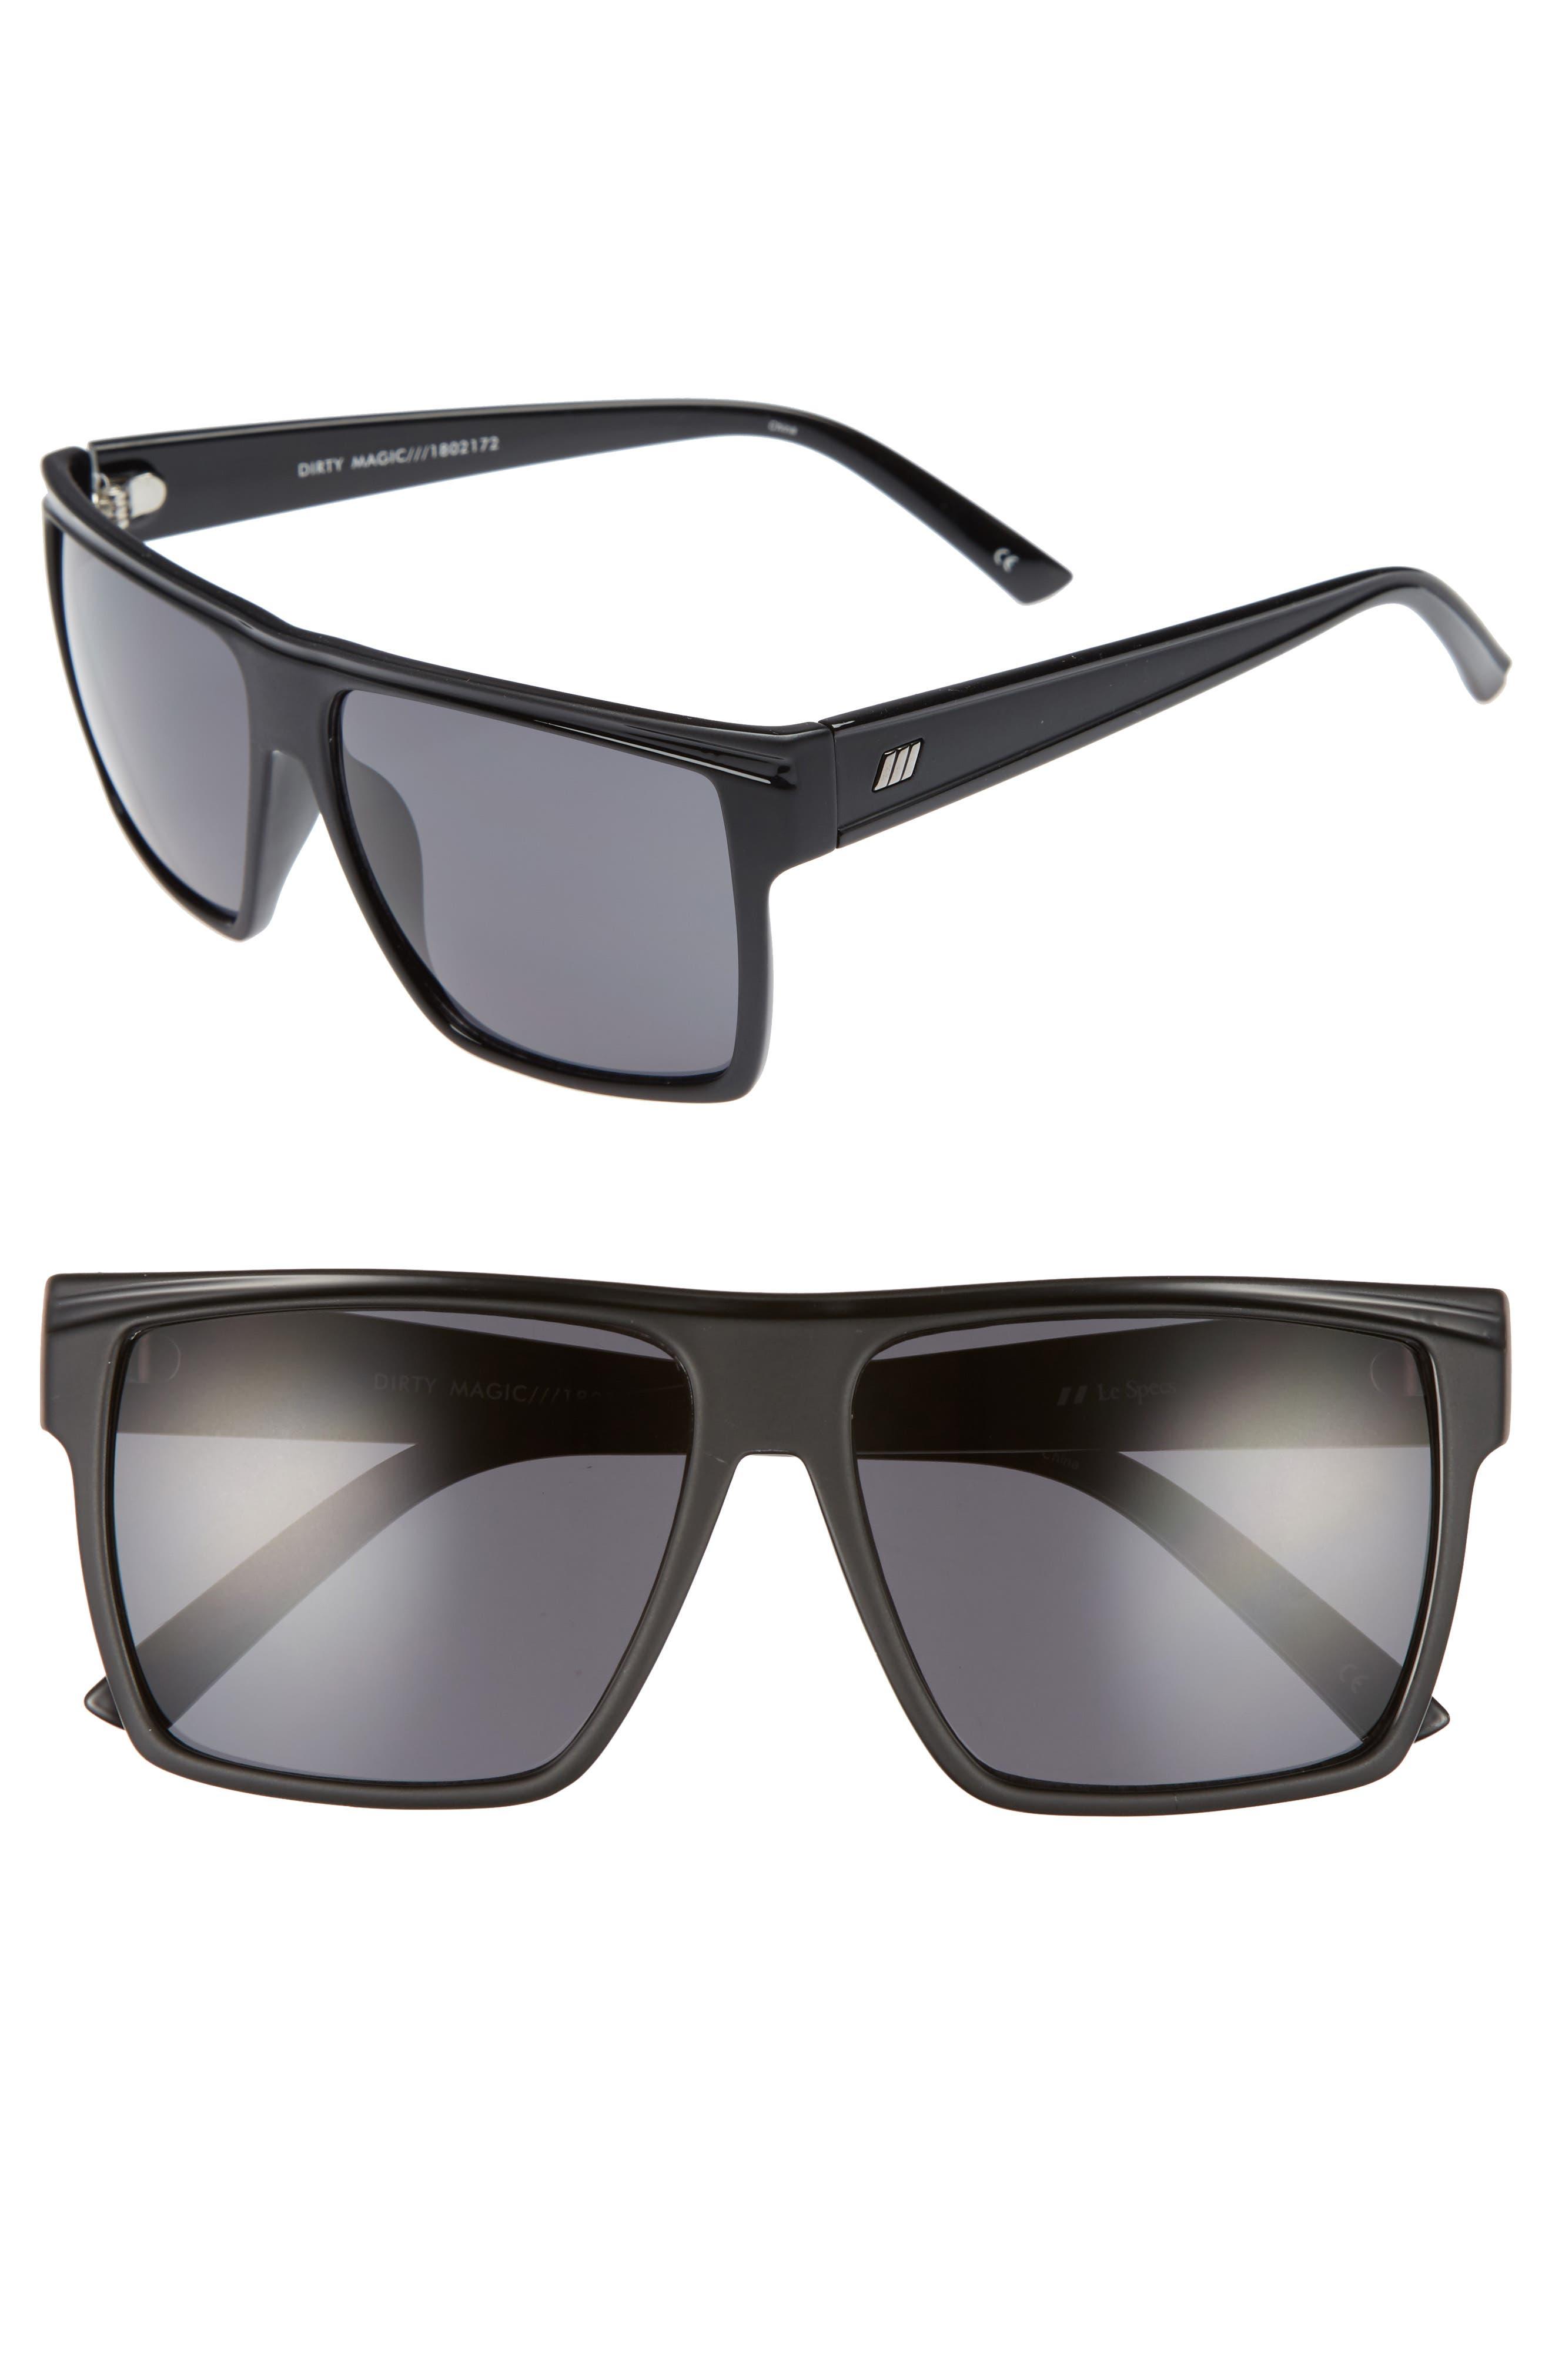 Dirty Magic 56mm Rectangle Sunglasses,                             Main thumbnail 1, color,                             Matte Black